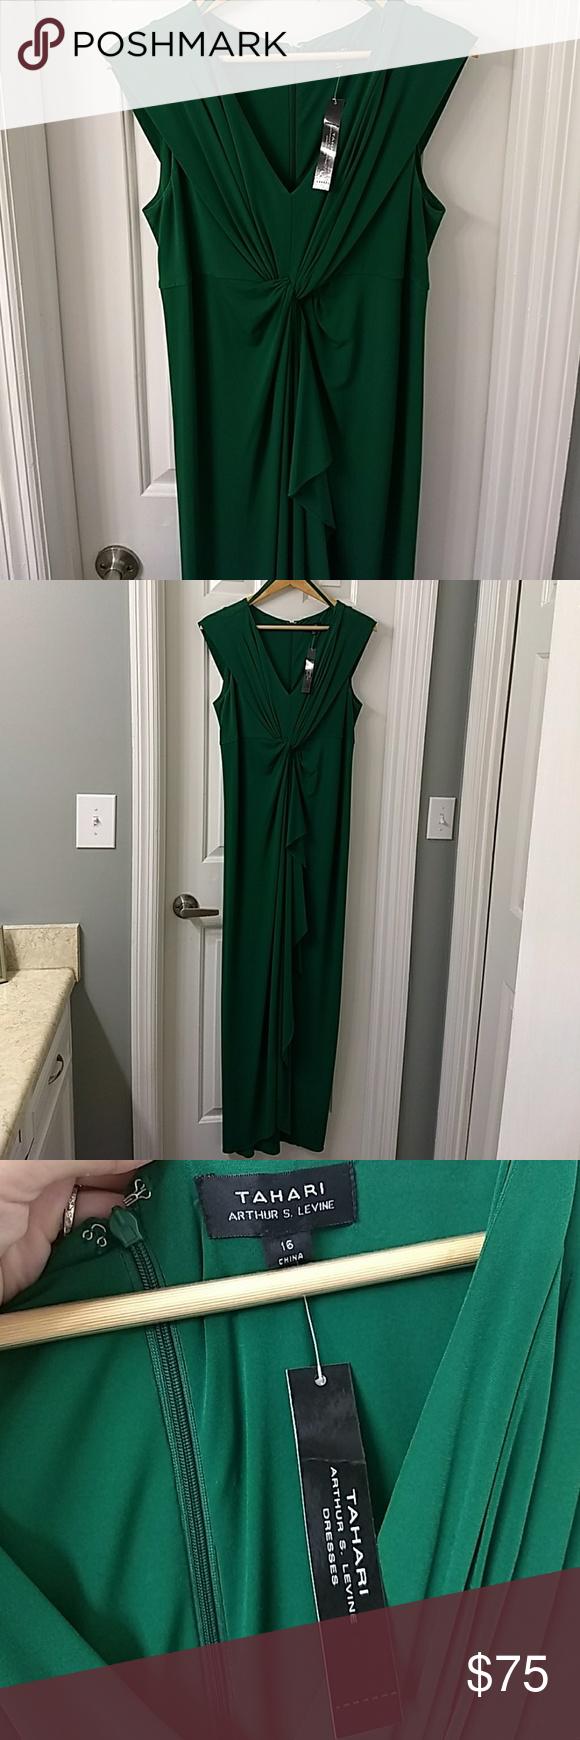 Gorgeous Emerald Green Tahari Maxi Dress Maxi Dress Green Dresses Maxi Dress [ 1740 x 580 Pixel ]